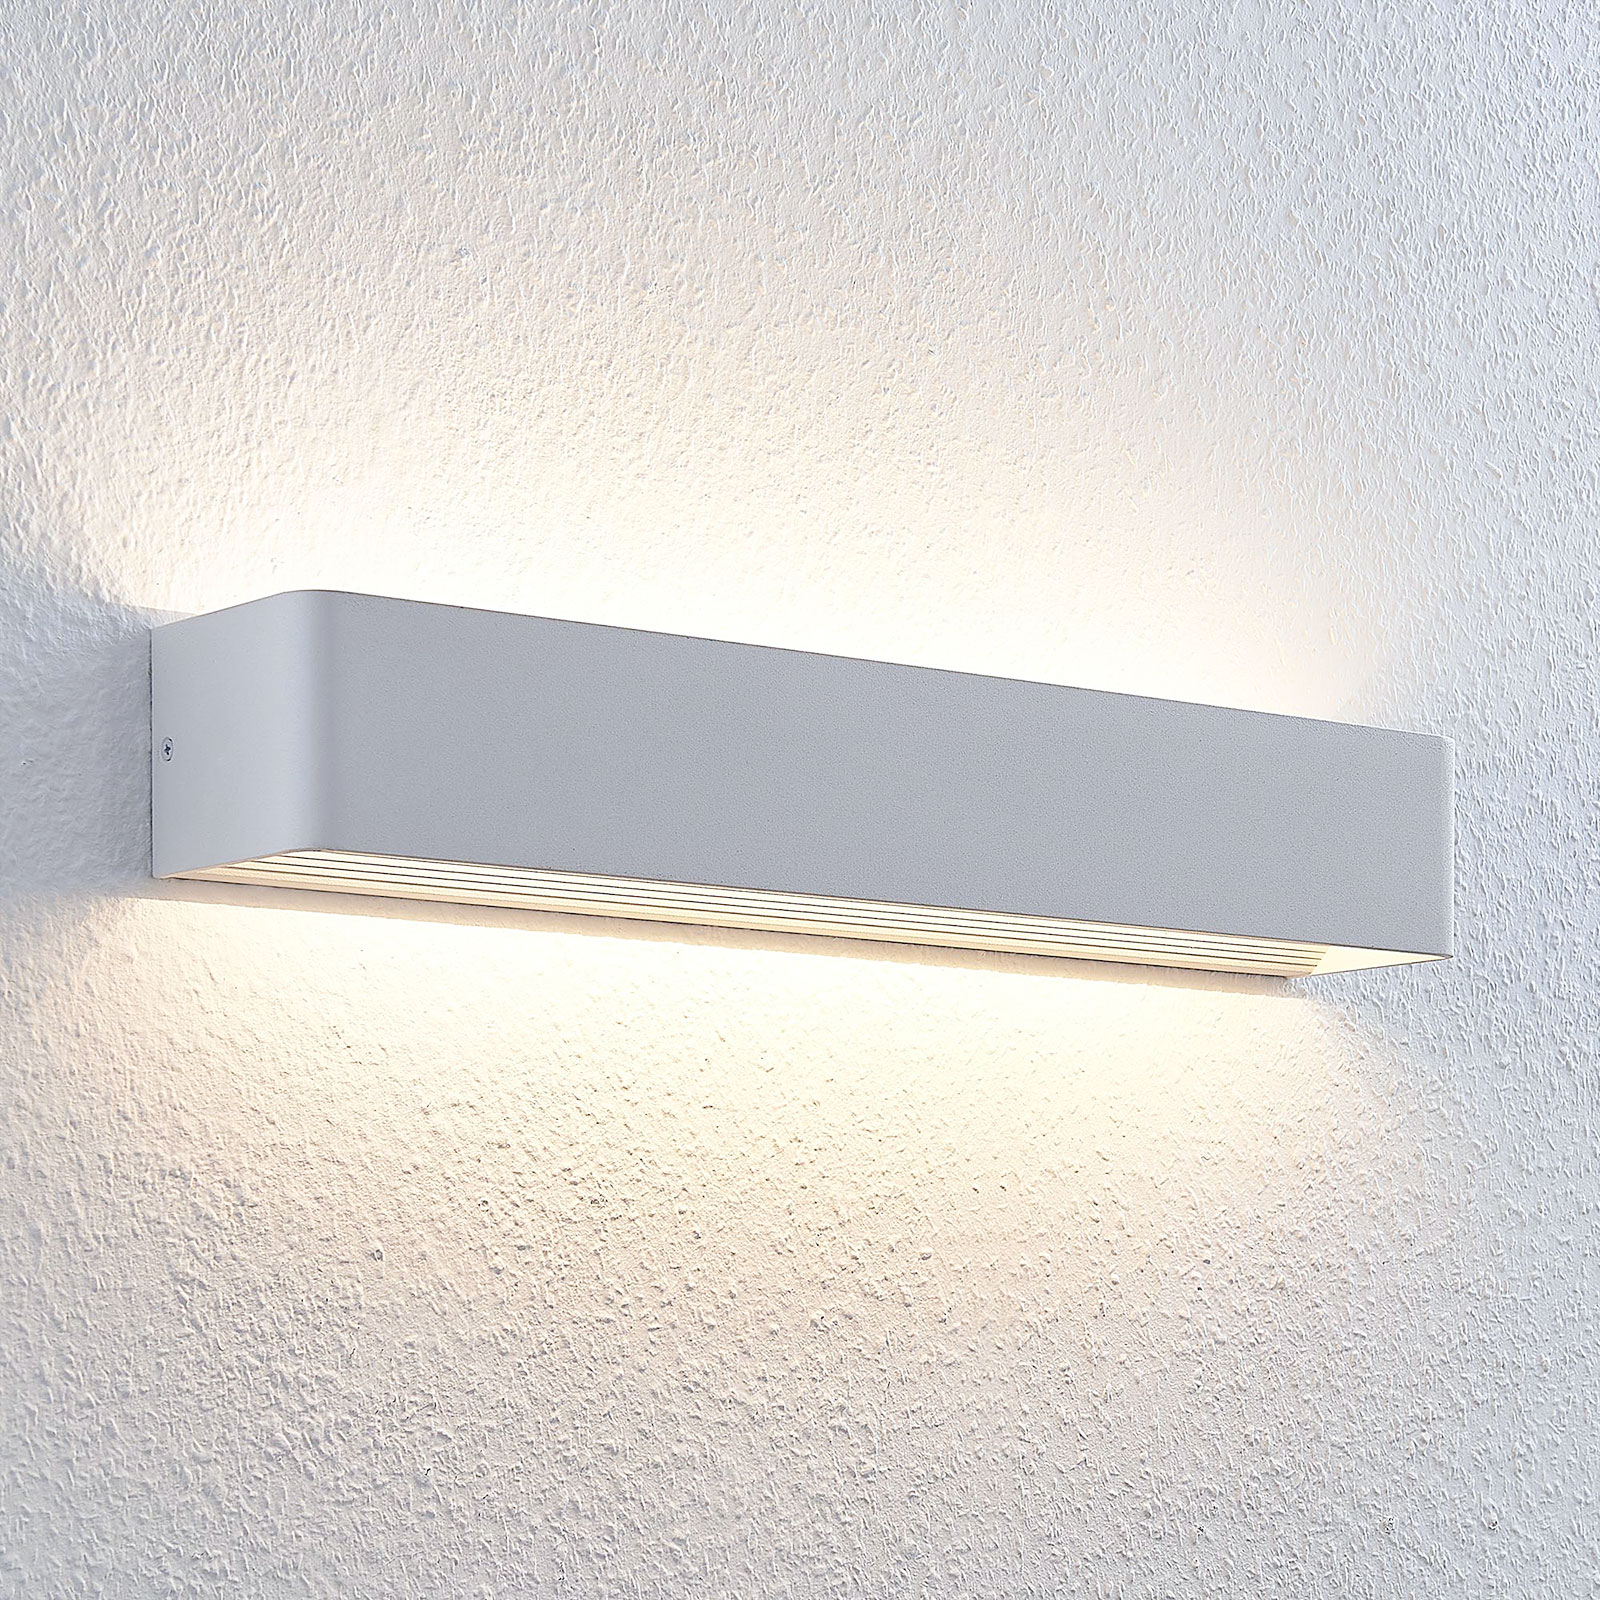 Mukava valaistus Lonisa LED-seinävalaisimella